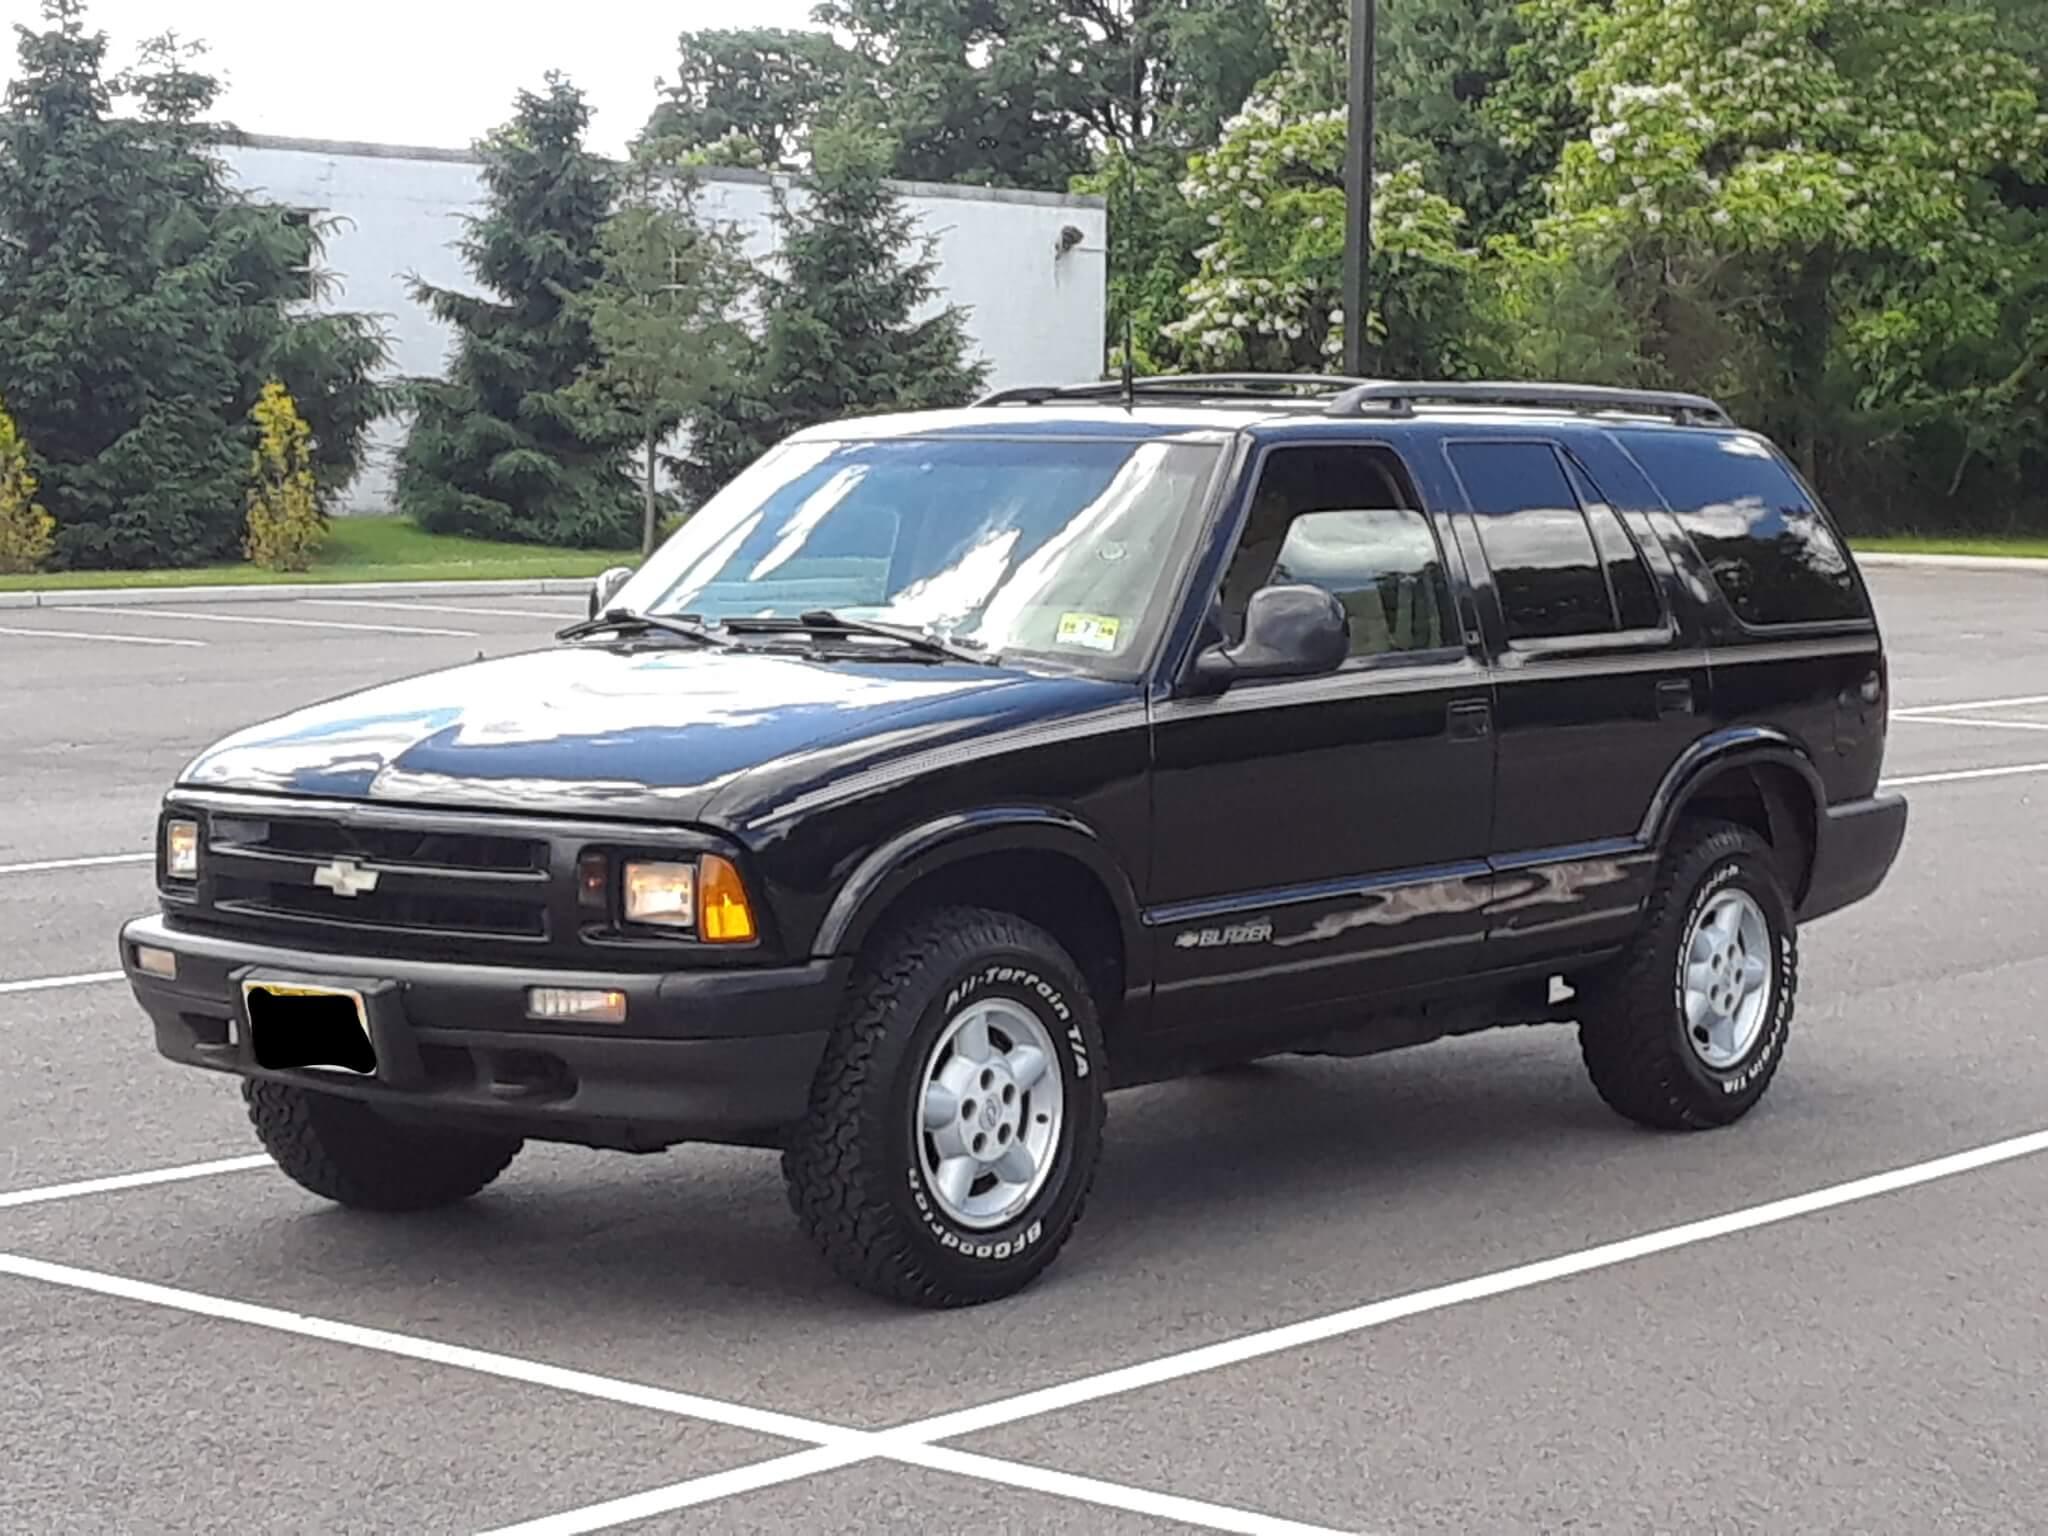 1996 Chevy S10 Blazer- Louis C.